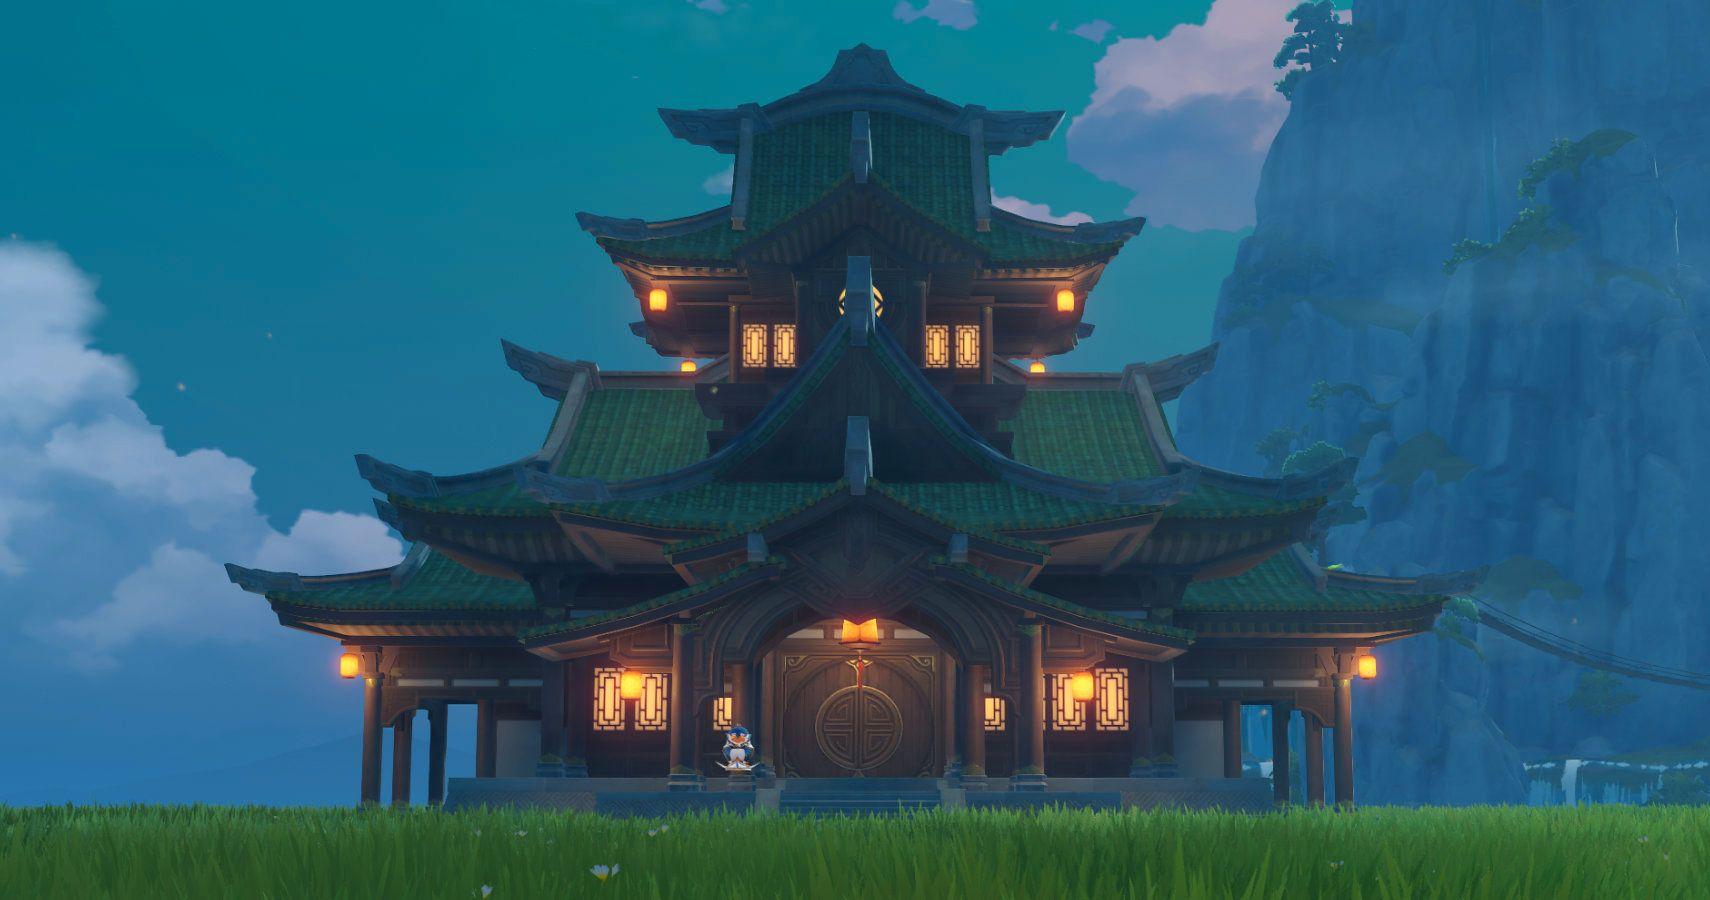 Genshin Impact: Every Building Blueprint For The Serenitea Pot